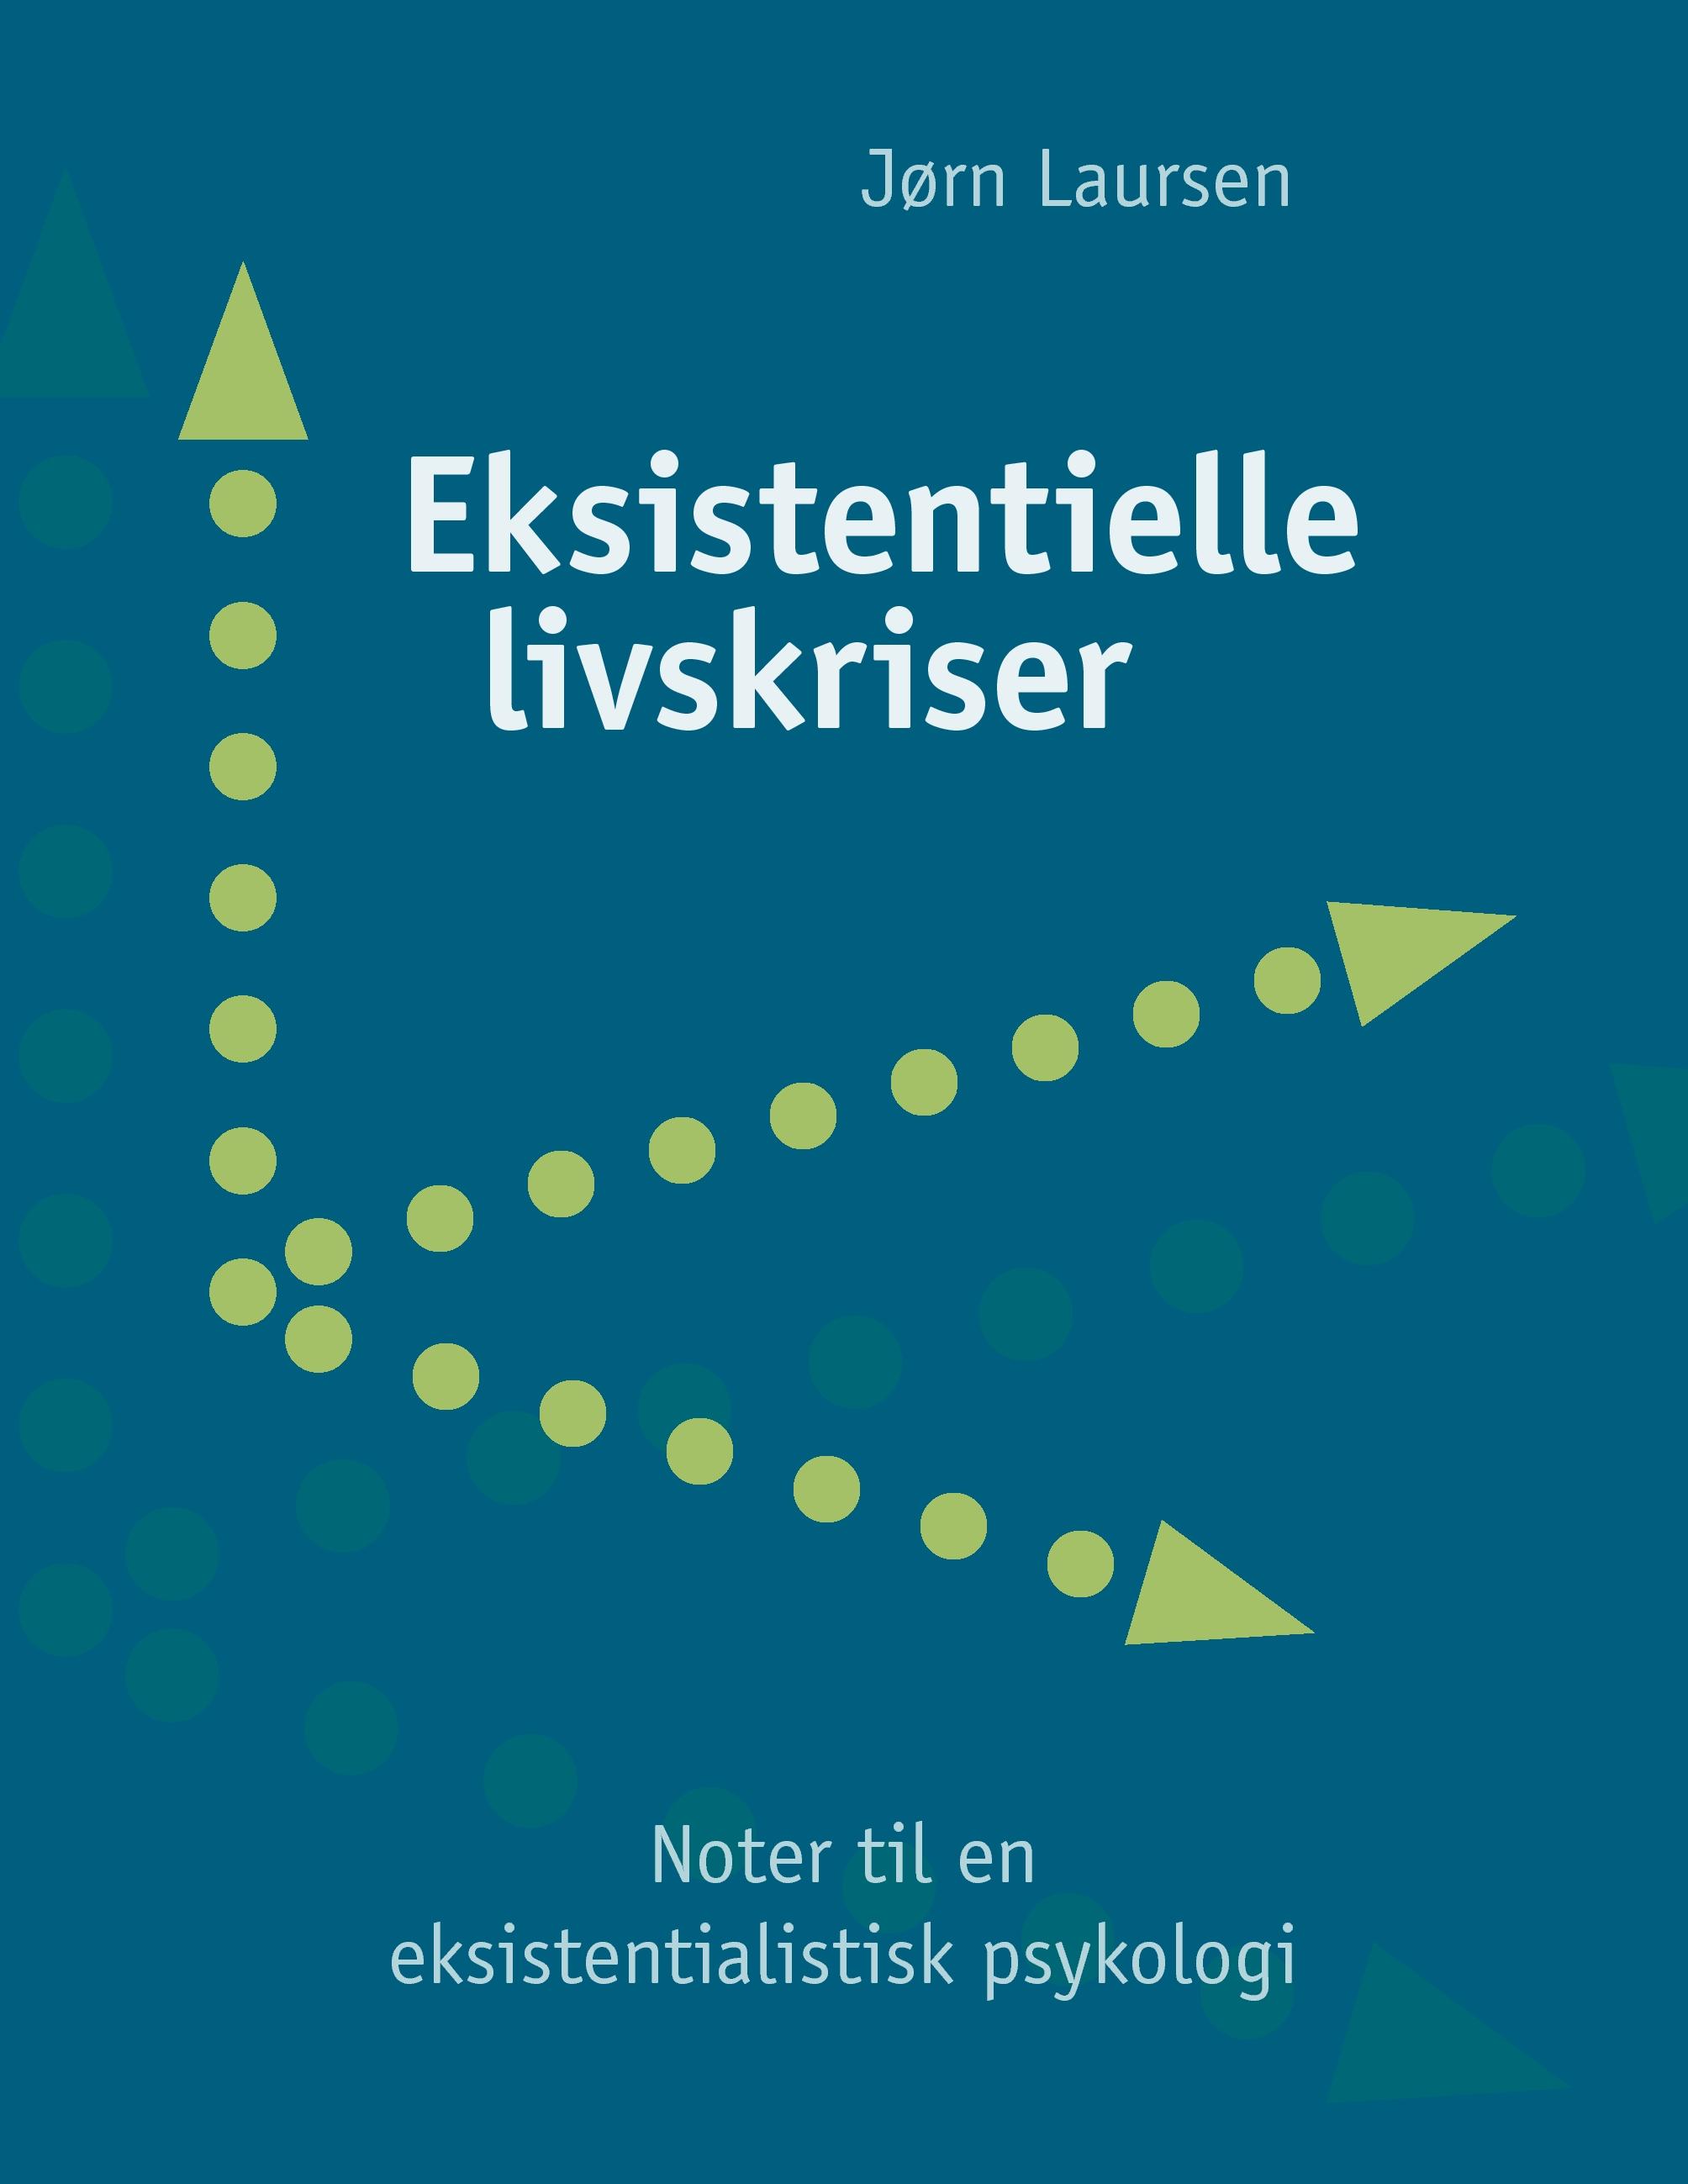 Eksistentielle livskriser - e-bog fra N/A fra bog & mystik